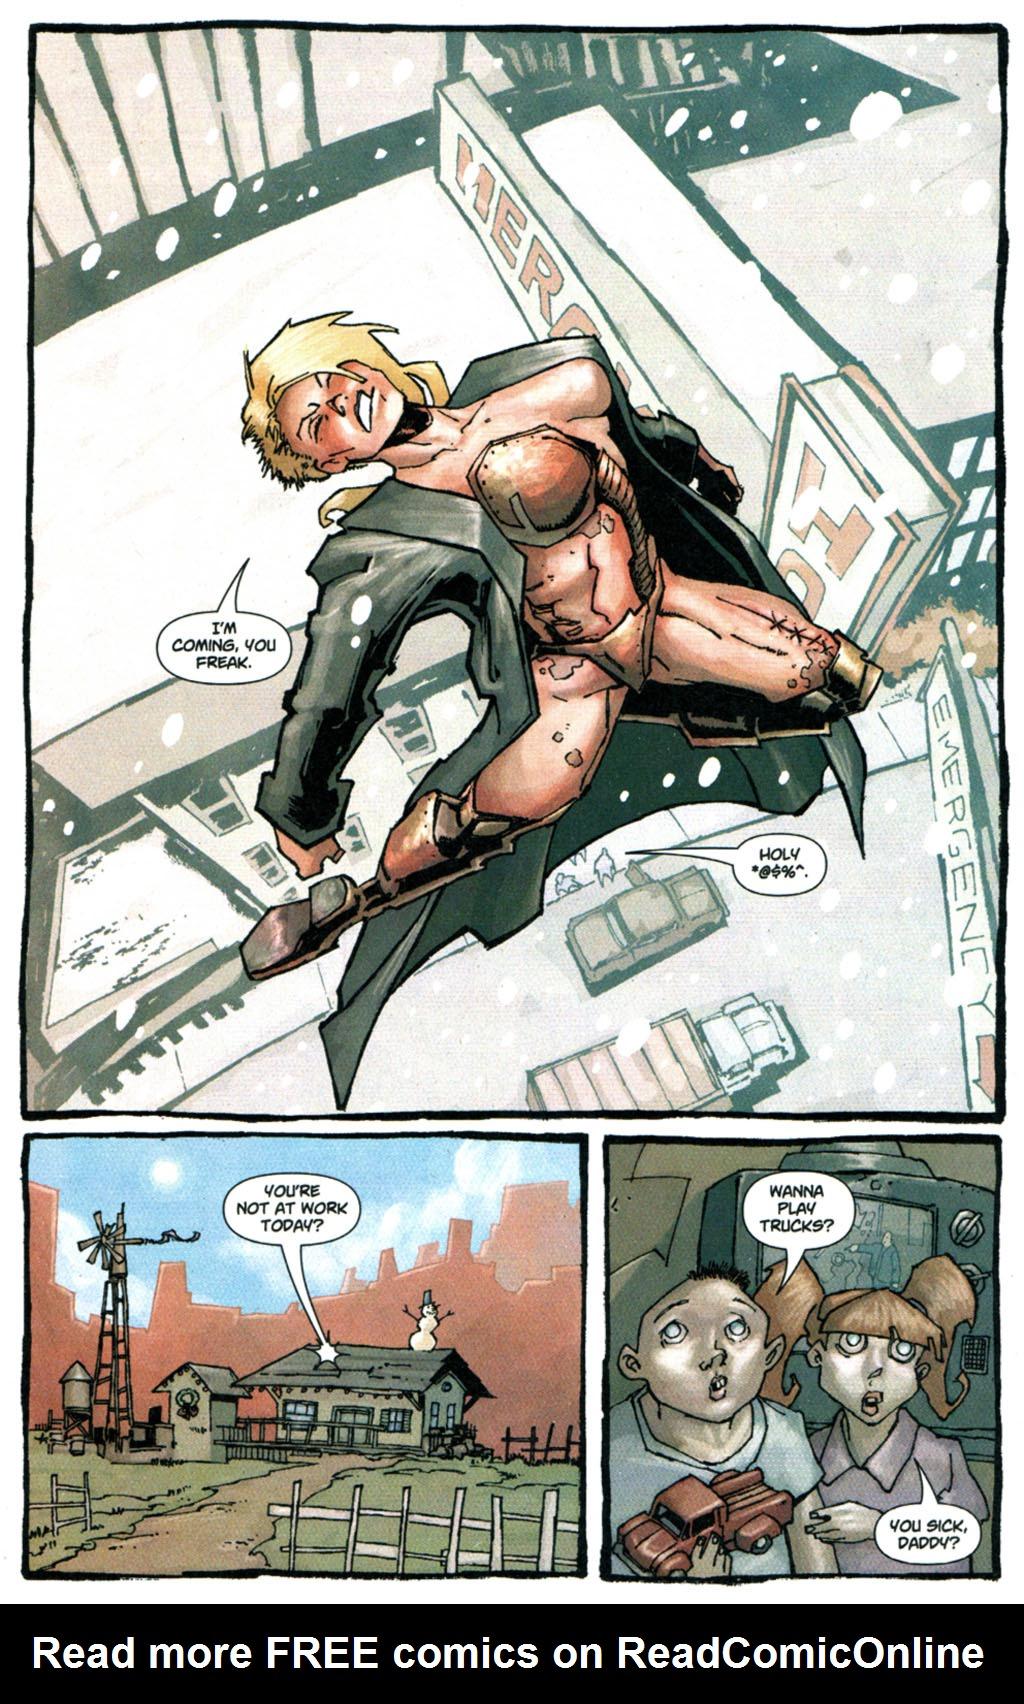 Read online Enginehead comic -  Issue #5 - 20